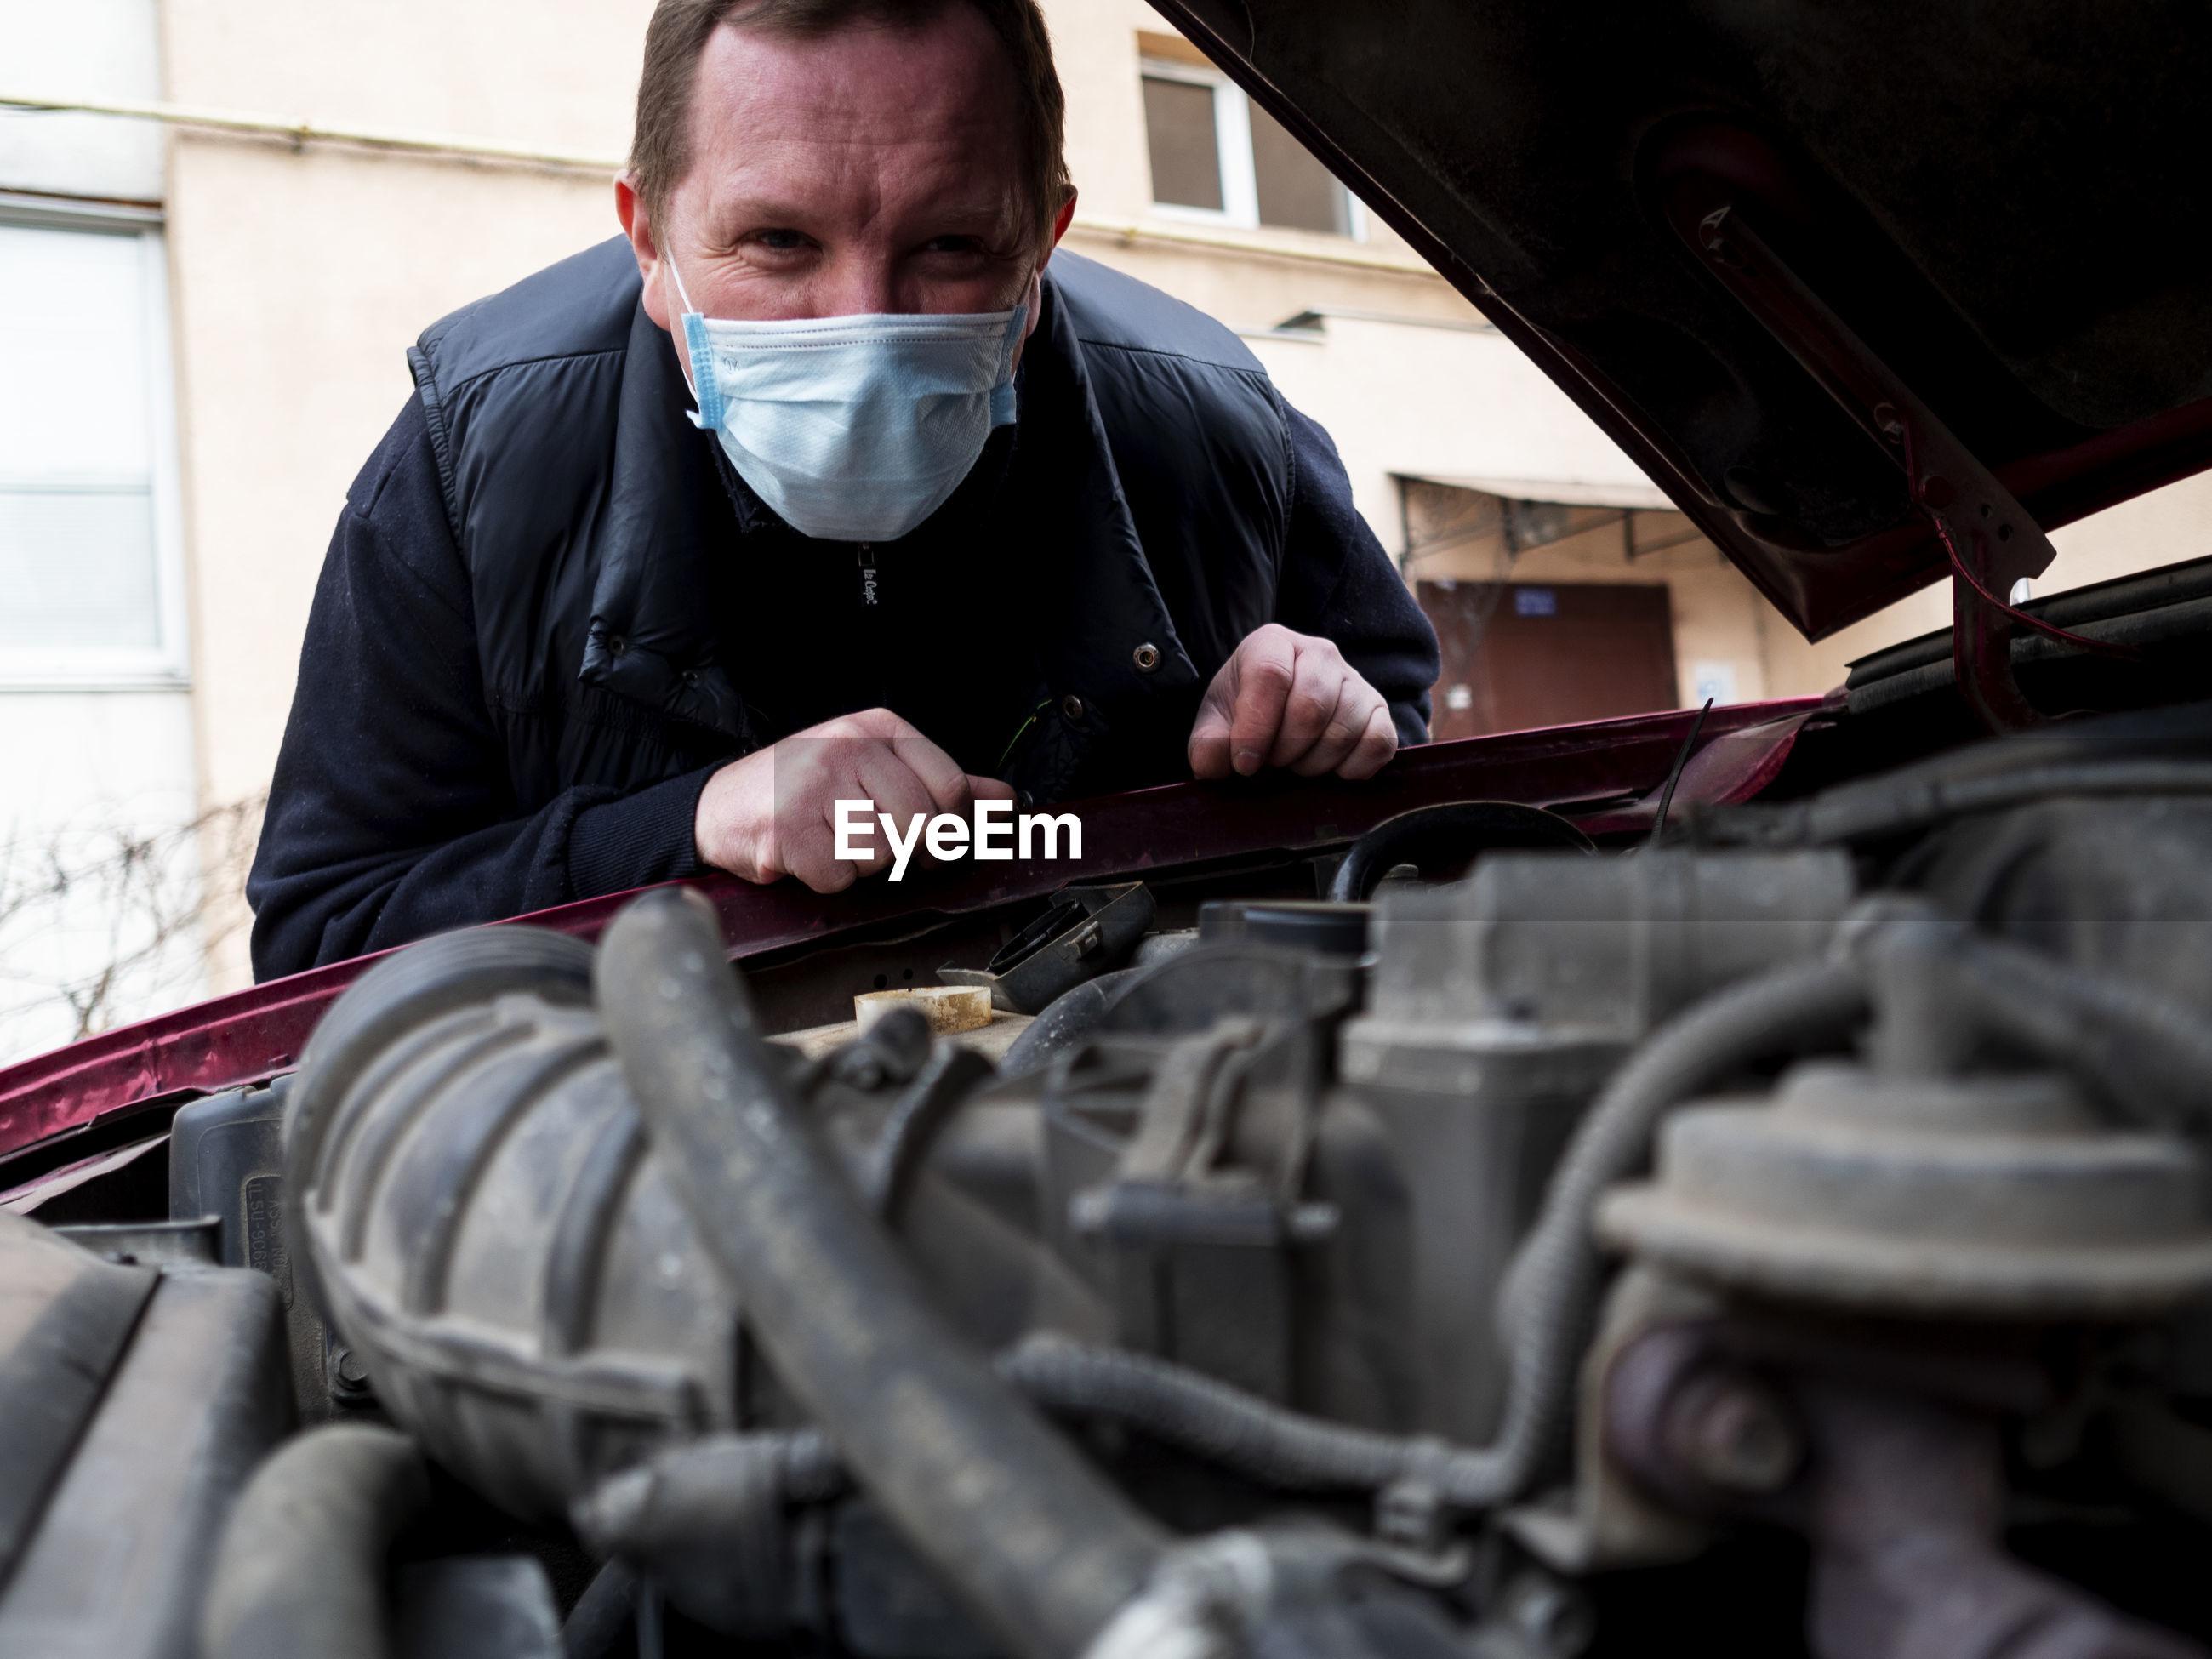 Portrait of man wearing mask examining car engine